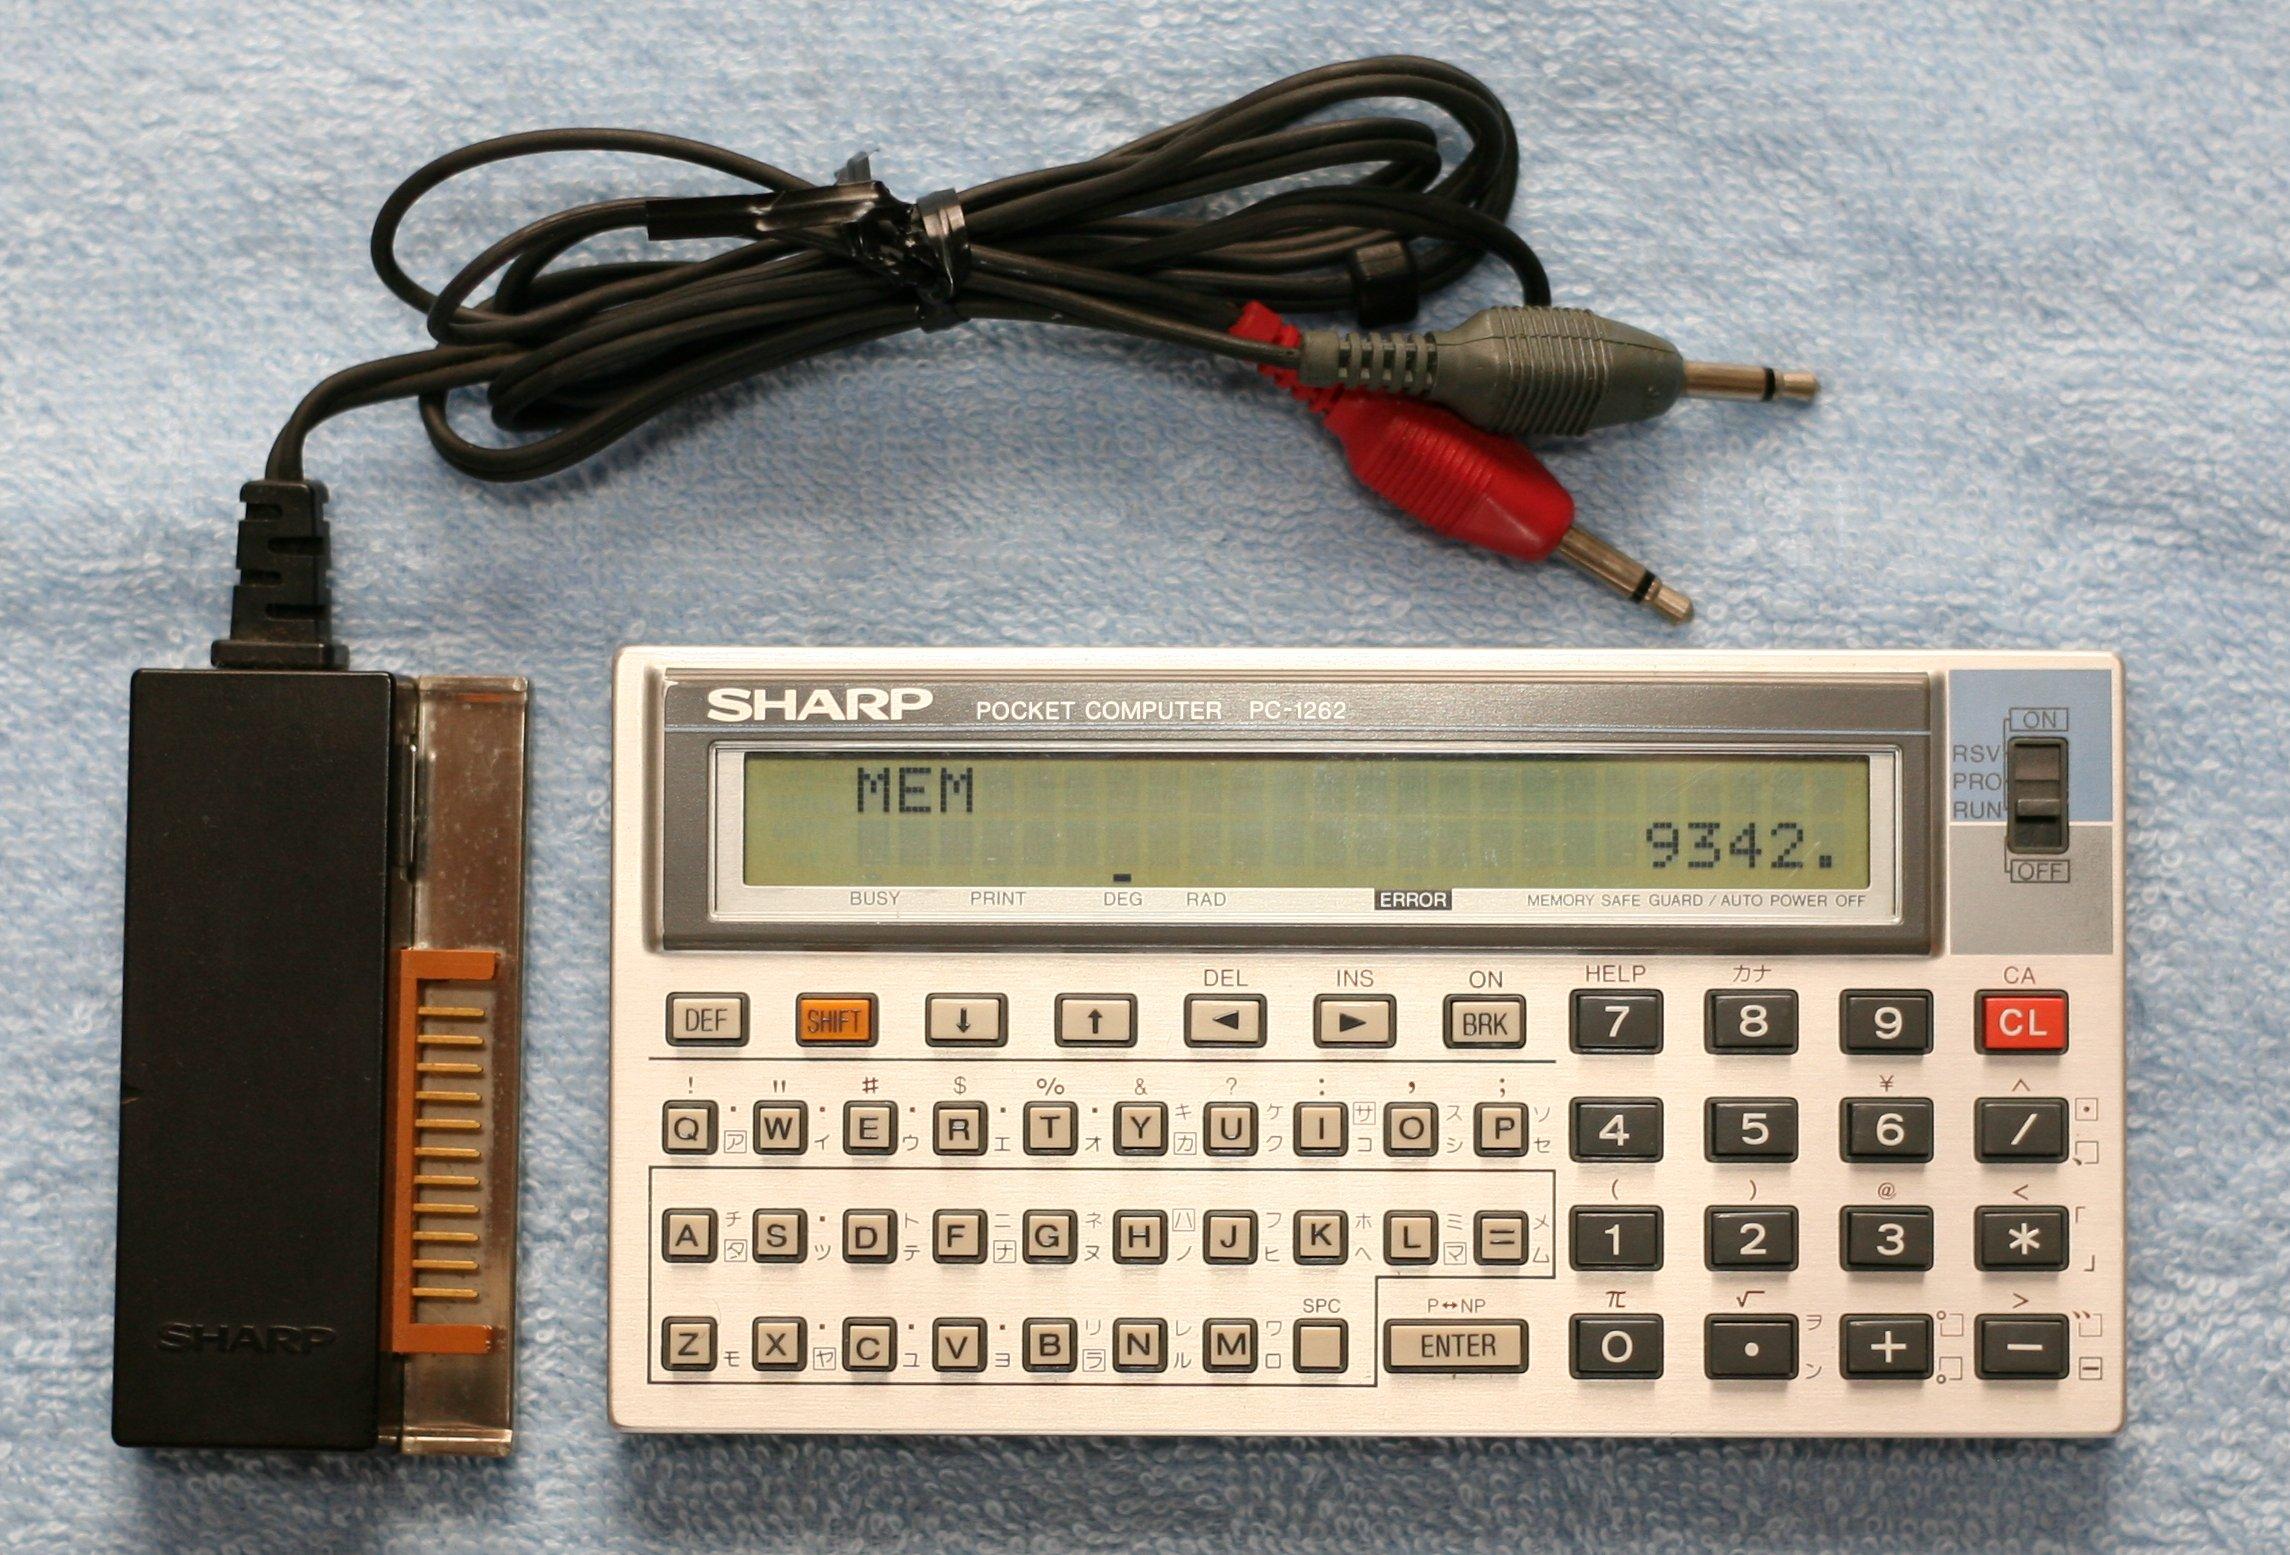 File:Pocket Computer SHARP PC-1262.jpg